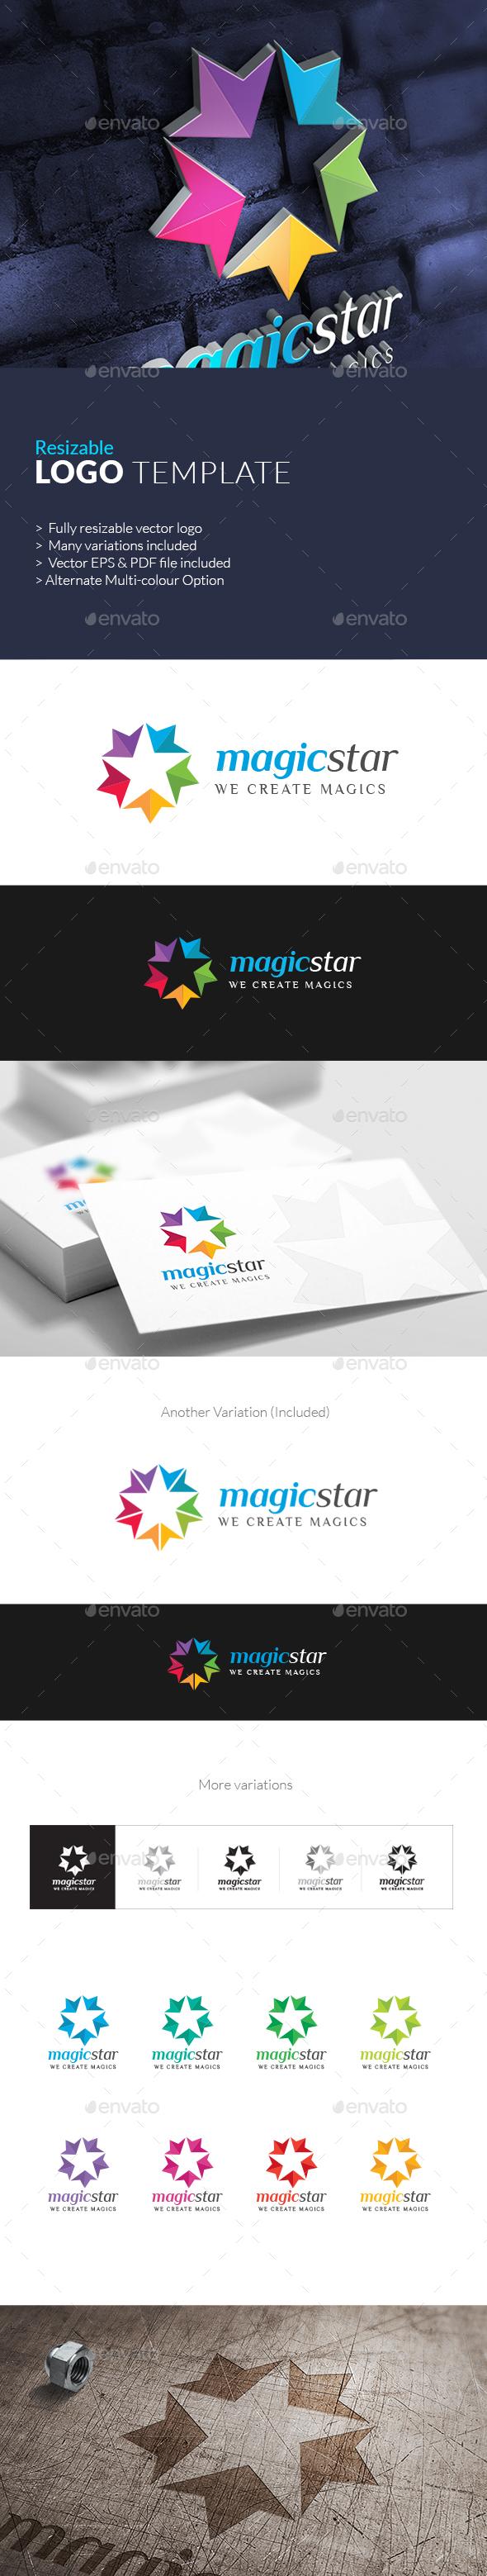 MagicStar Creative Brand Logo - Symbols Logo Templates